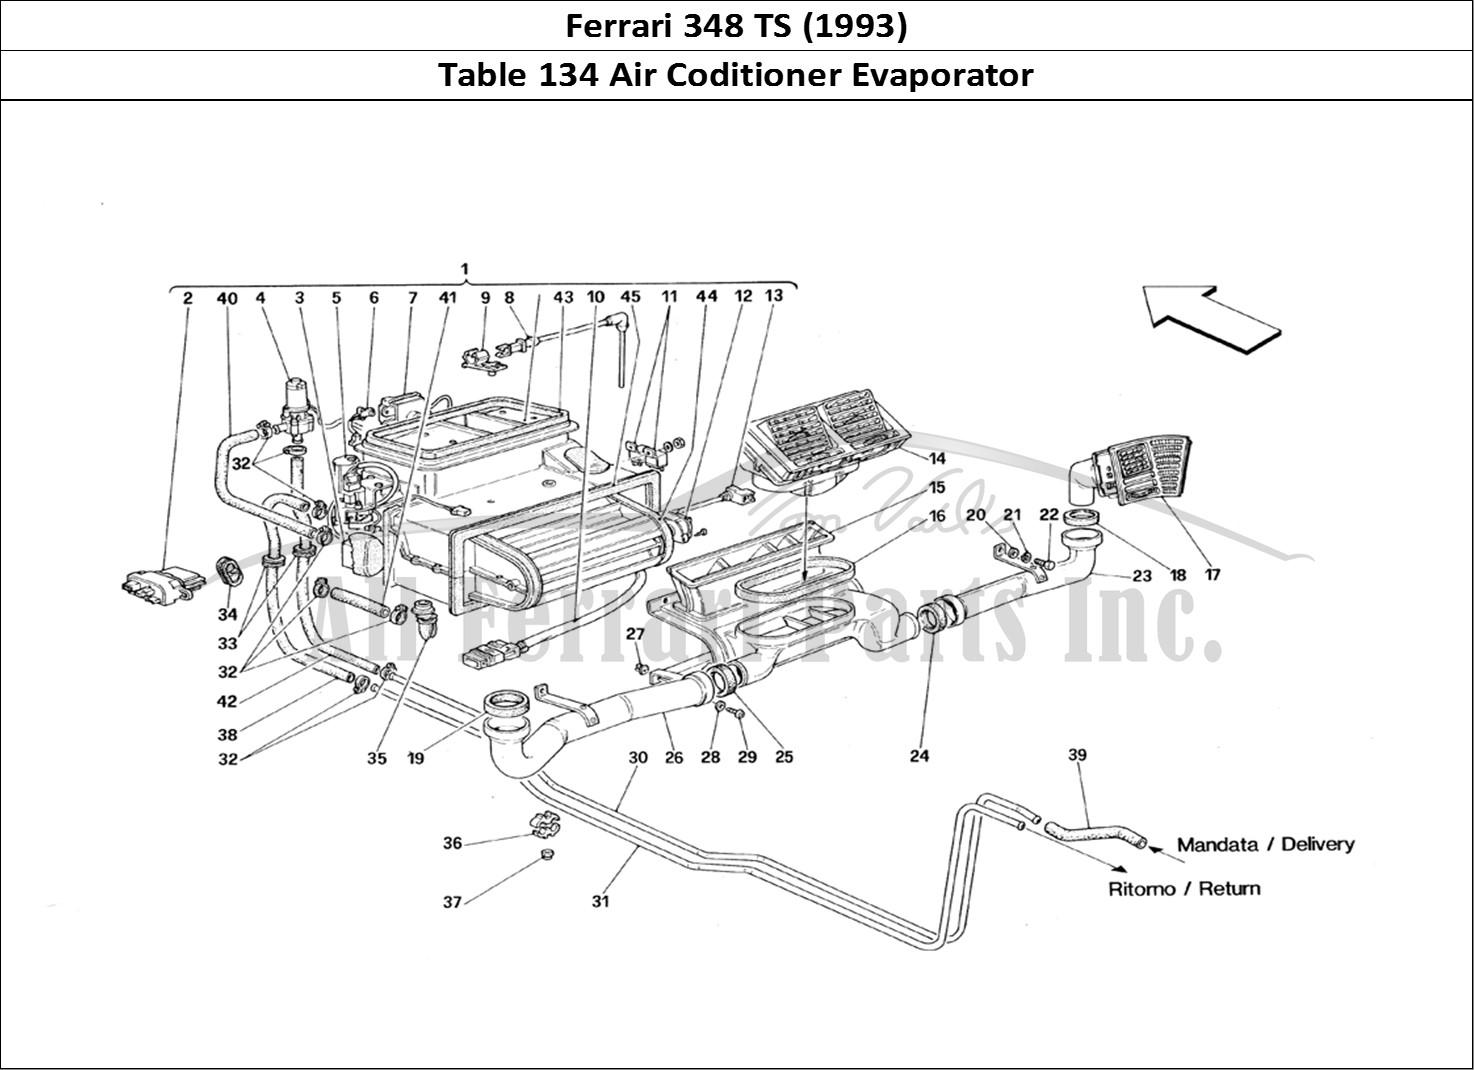 Buy Original Ferrari 348 Ts 134 Air Coditioner